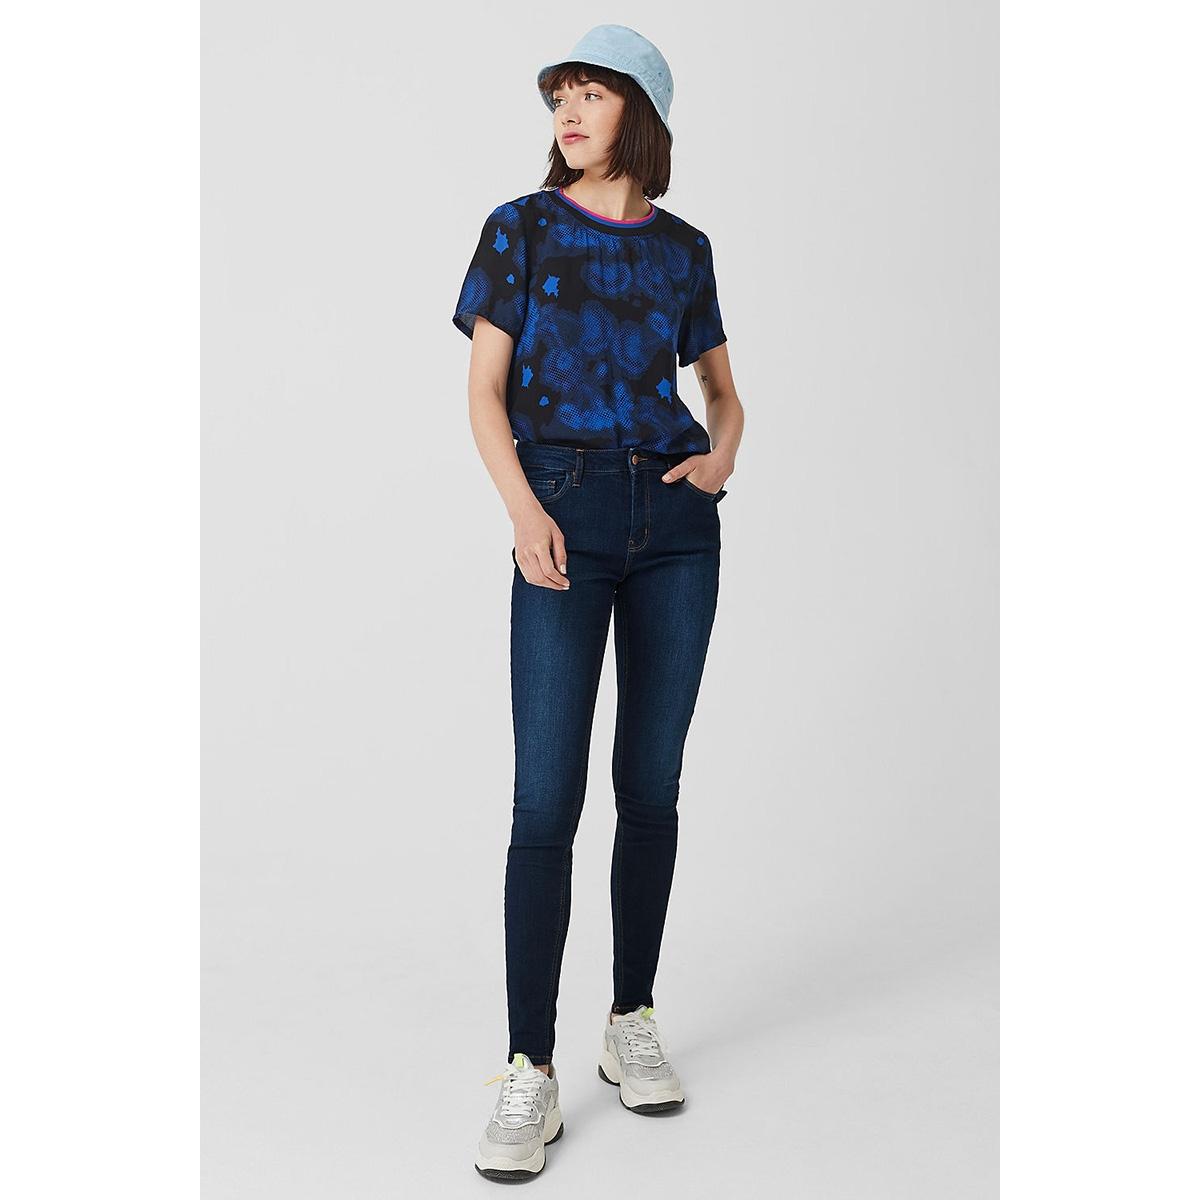 sadie 45899713030 q/s designed by jeans 58z6